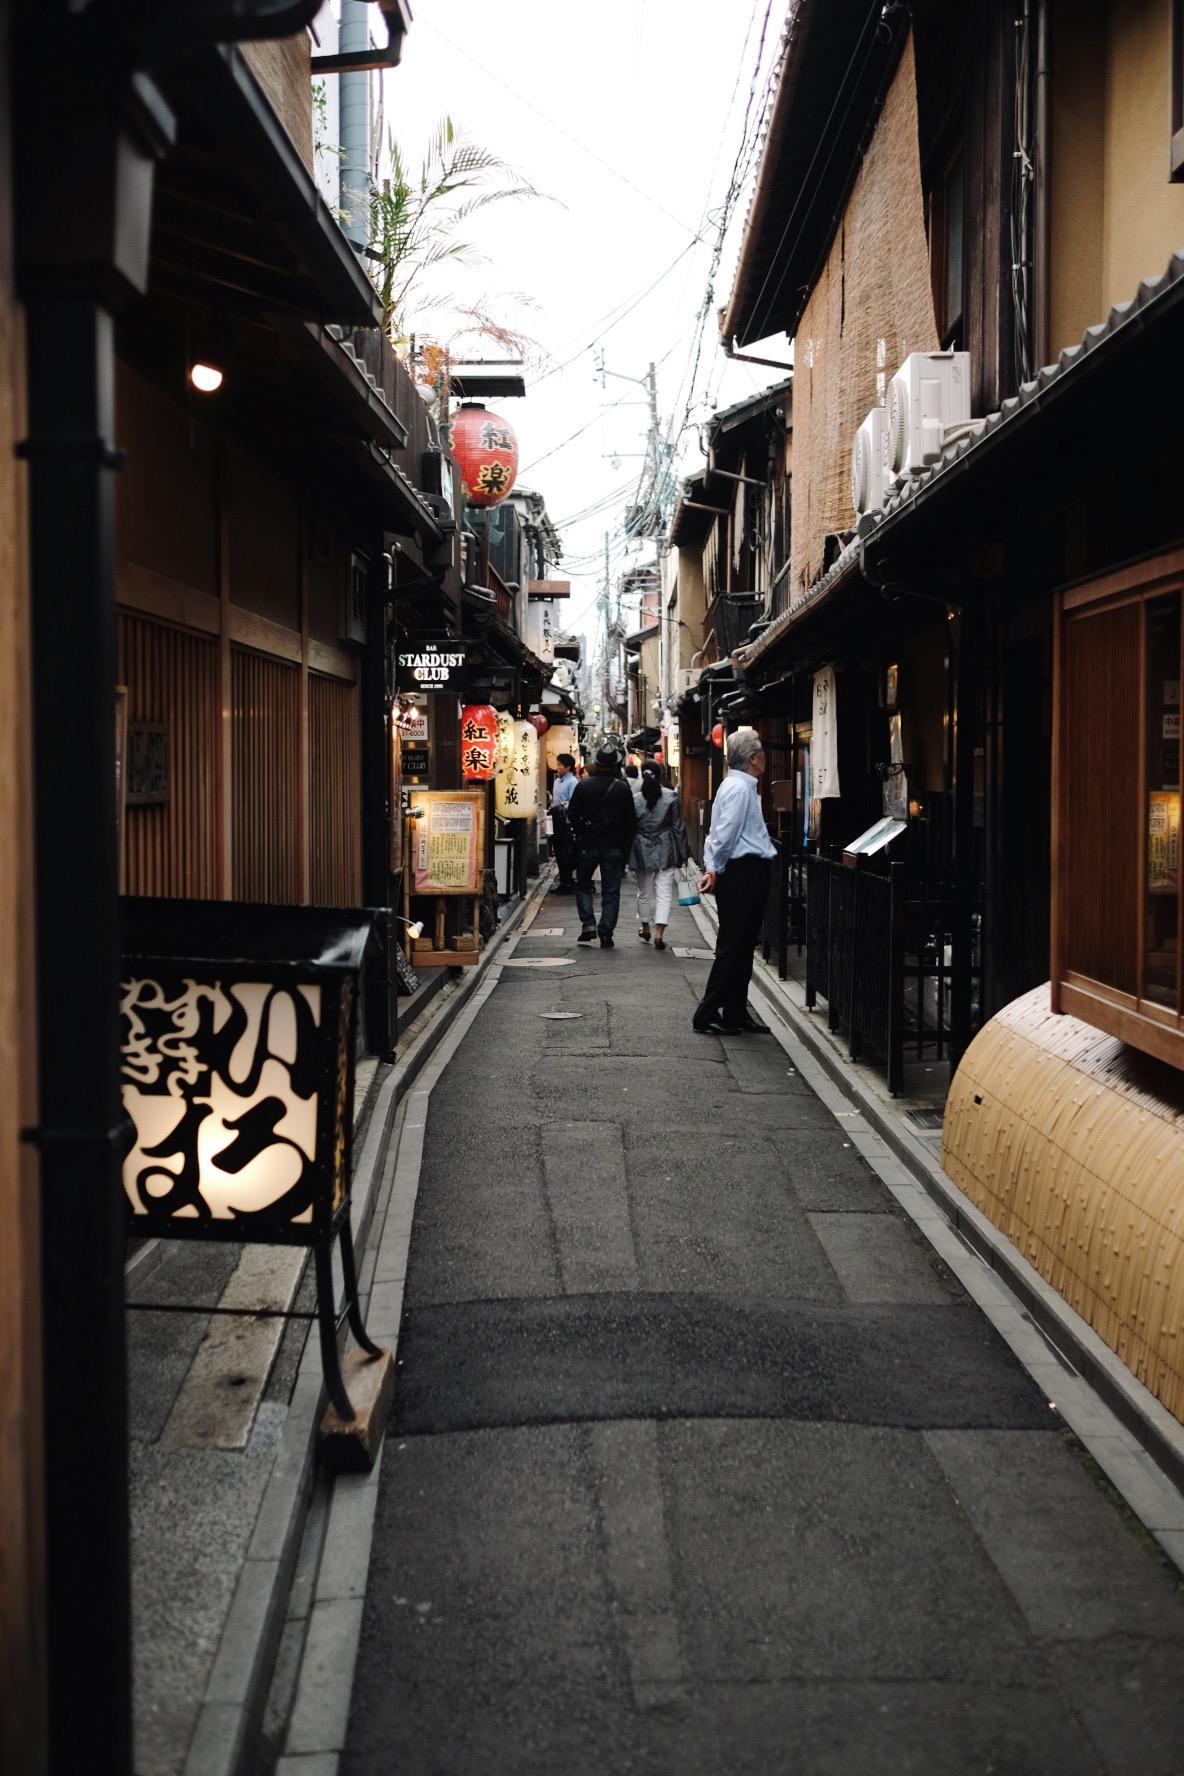 Ponto-cho   (先斗町)    in  Kyoto